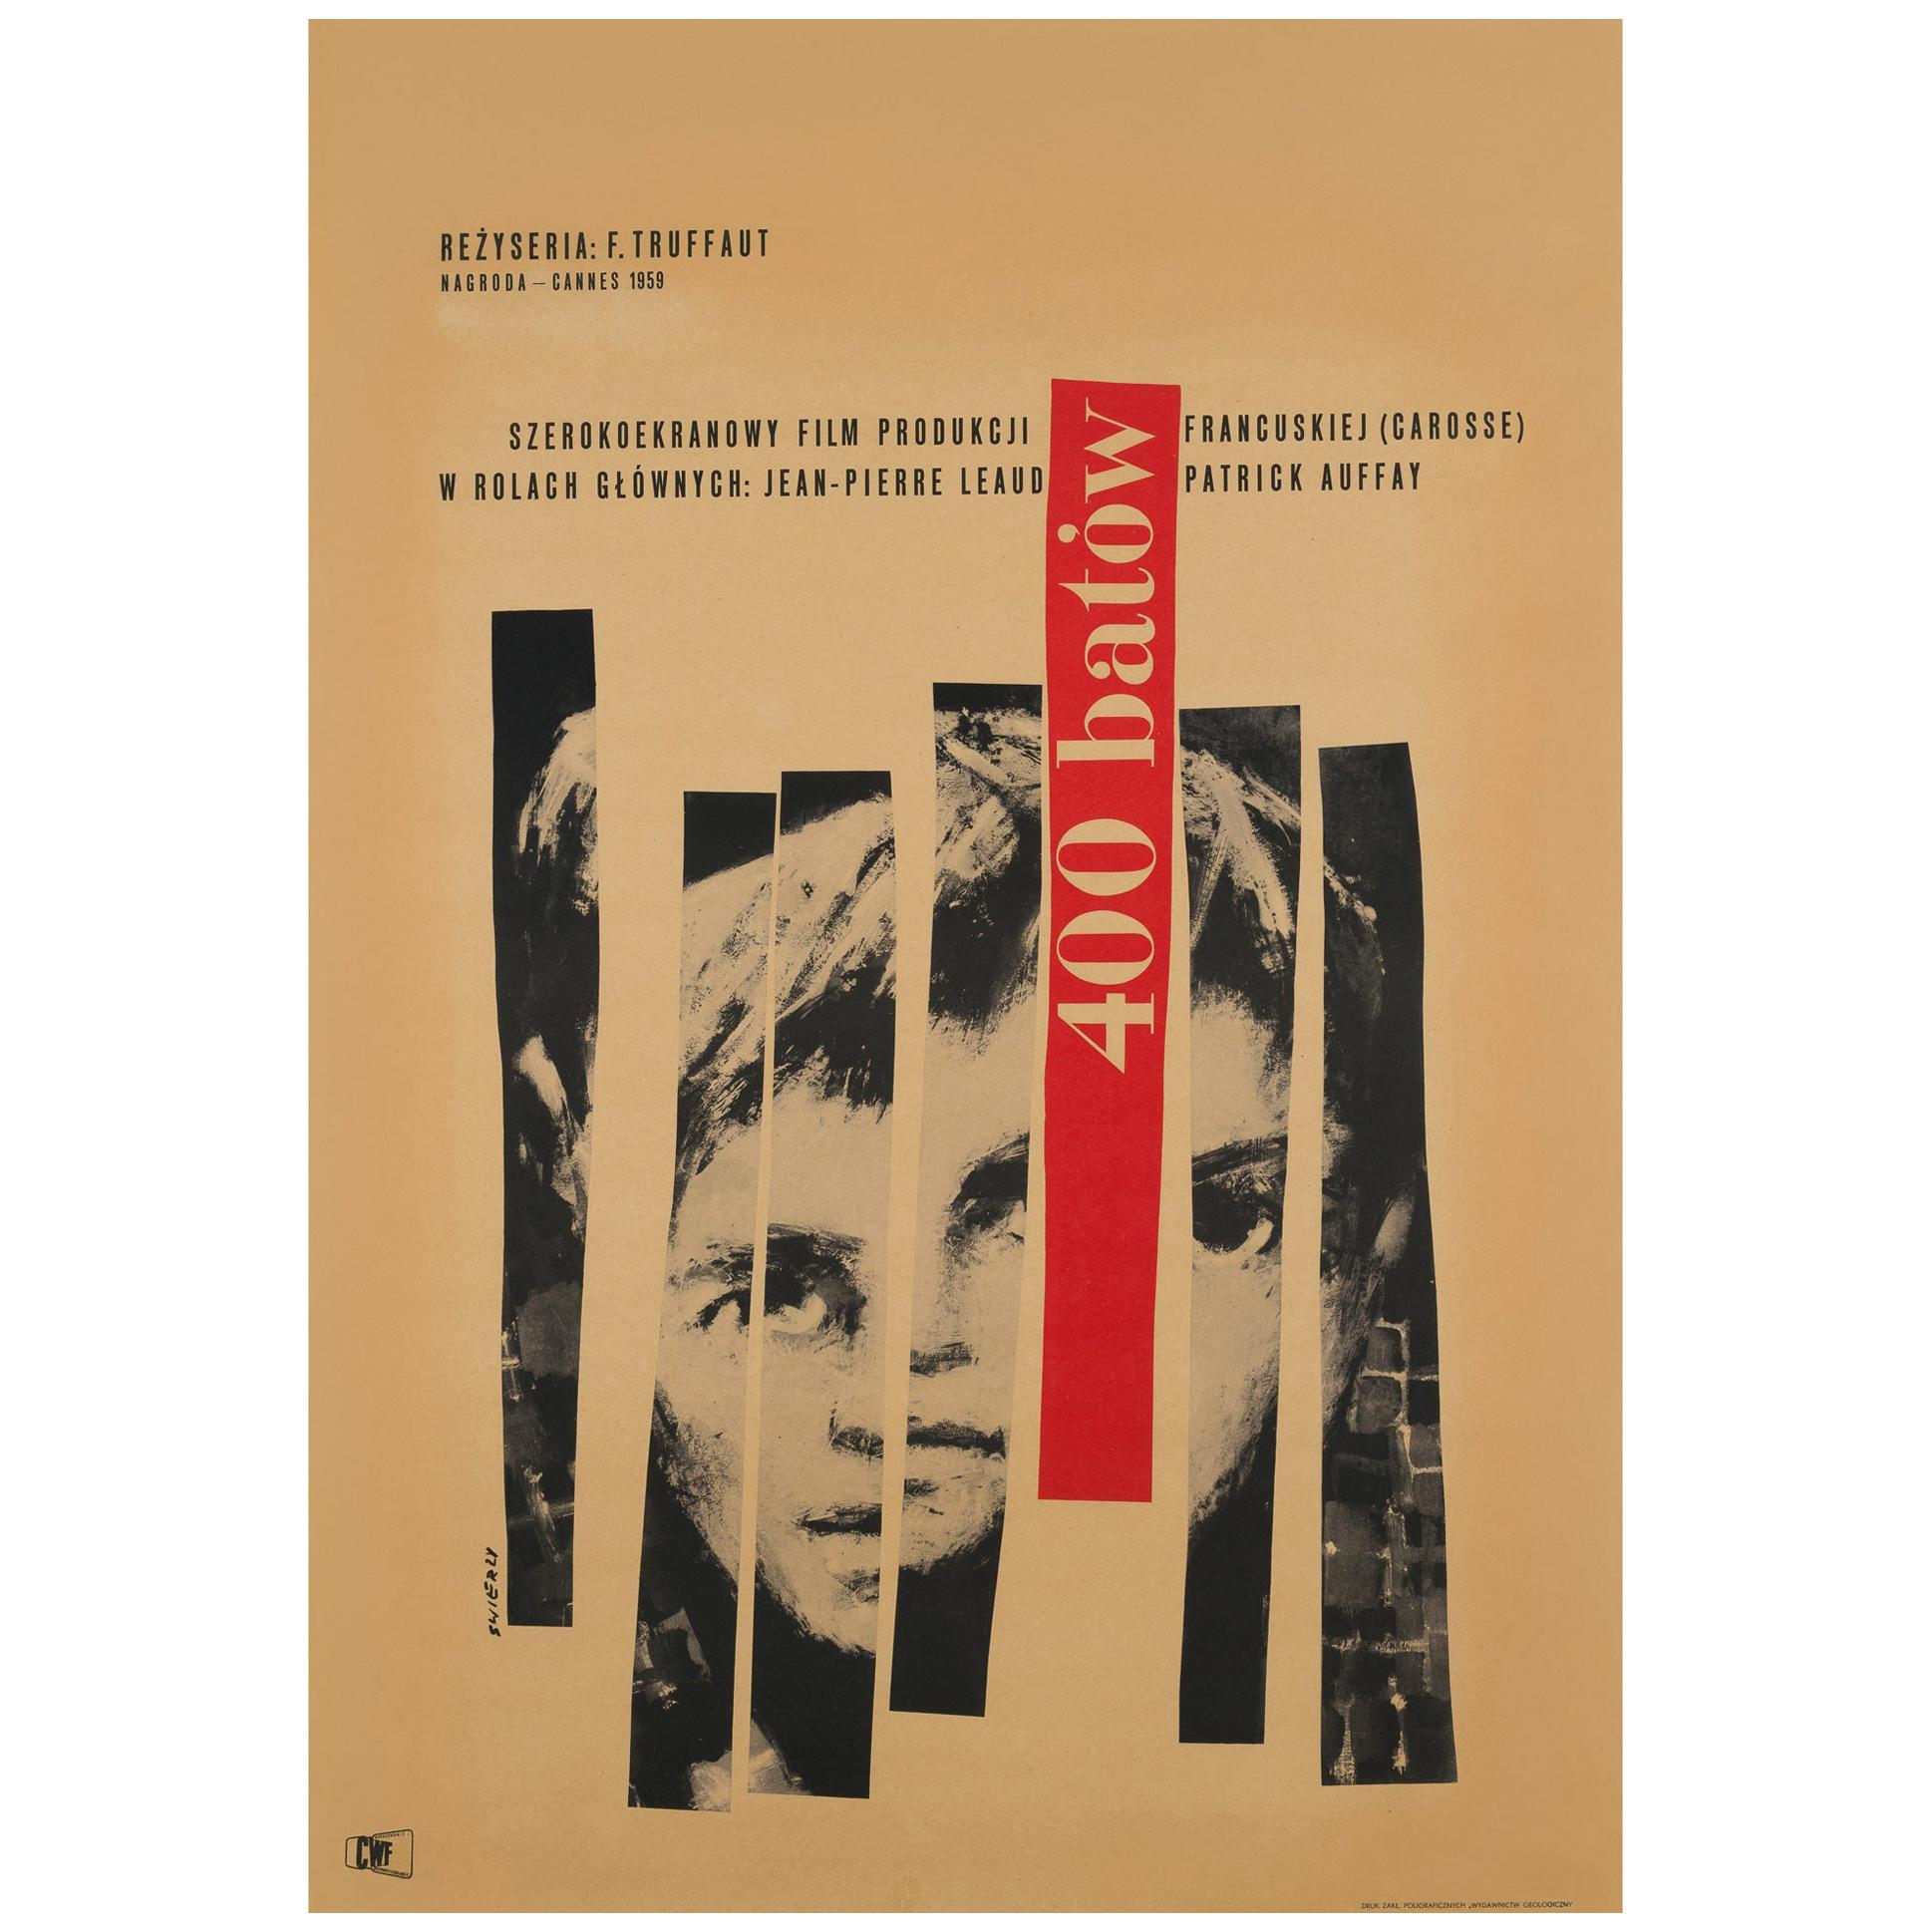 400 Blows 1960 Polish Film Poster, Waldemar Swierzy